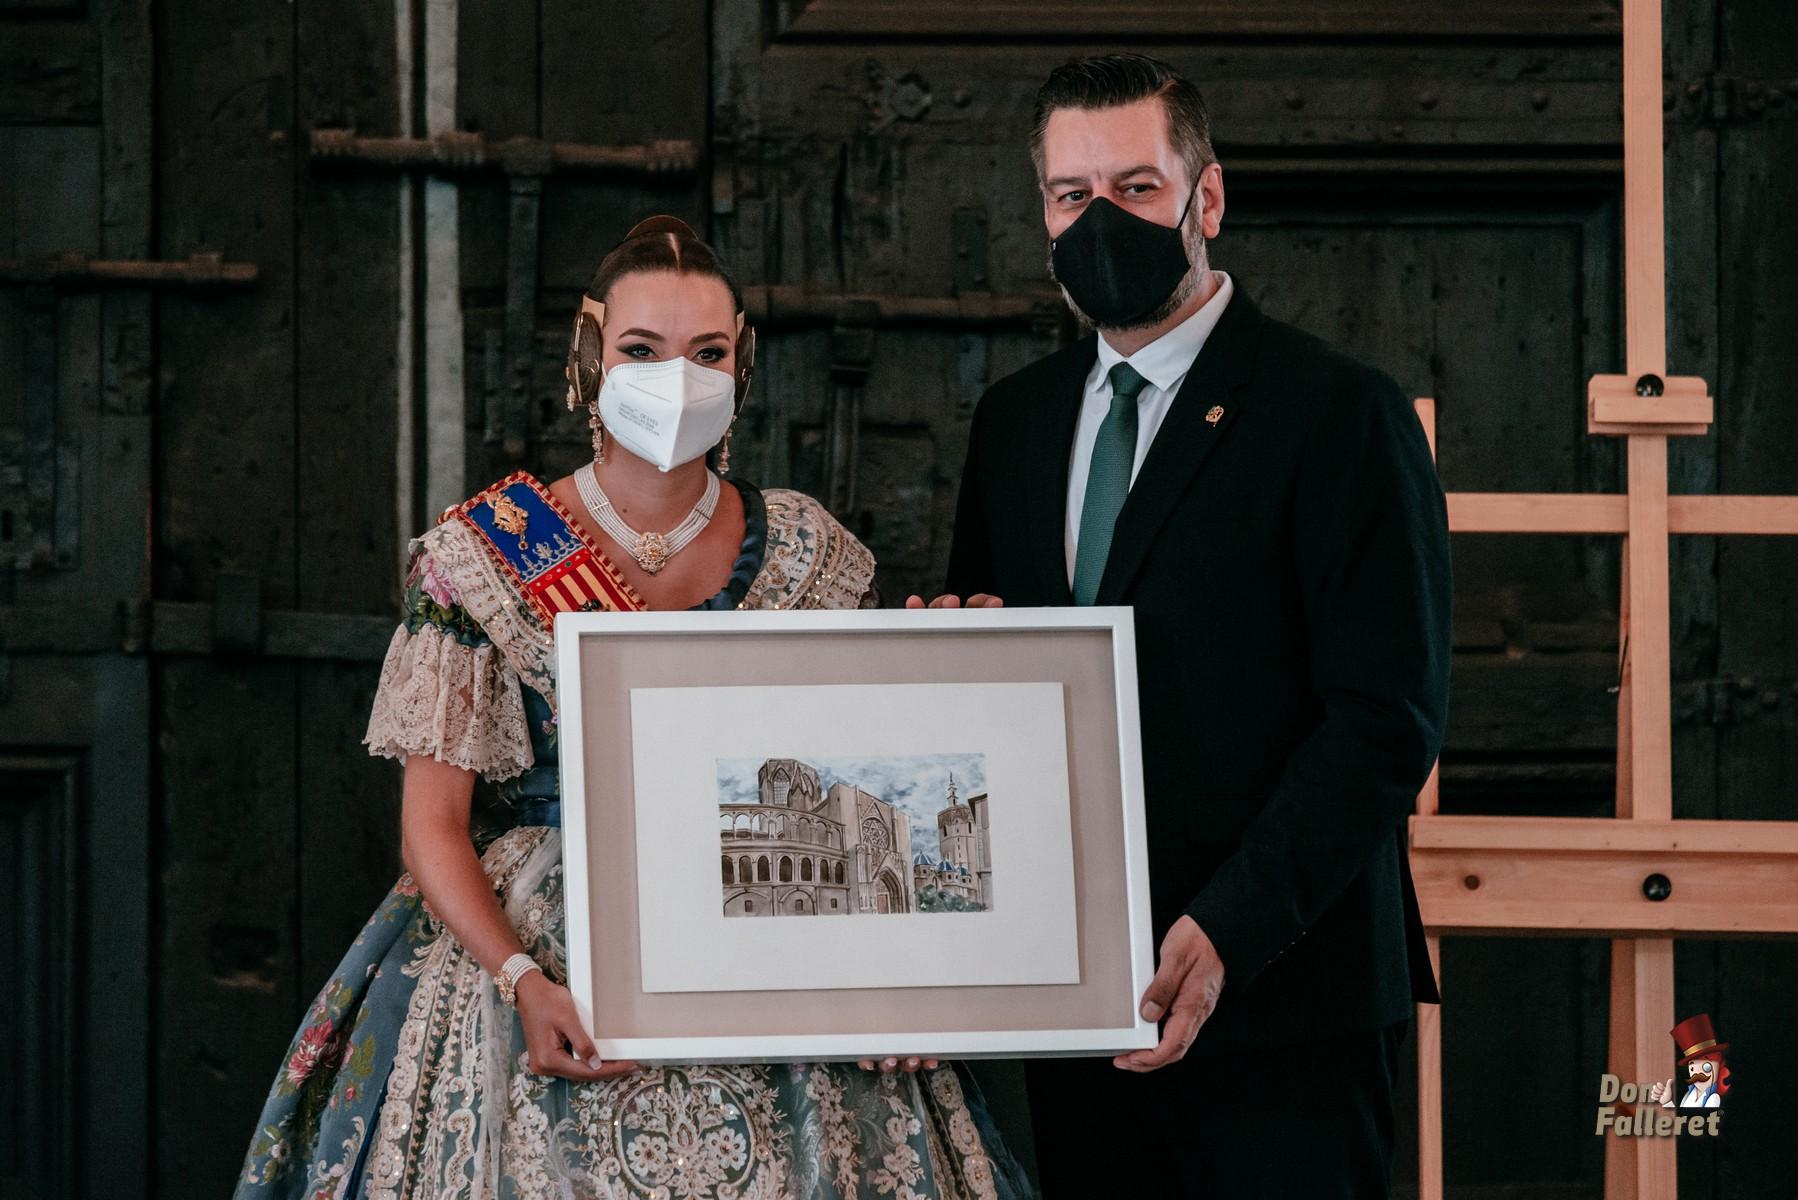 Carlos Galiana, Presidente de Junta Central Fallera, hizo entrega del Premio La Seu a Consuelo LLobell. Foto: Fran Adlert/Don Falleret